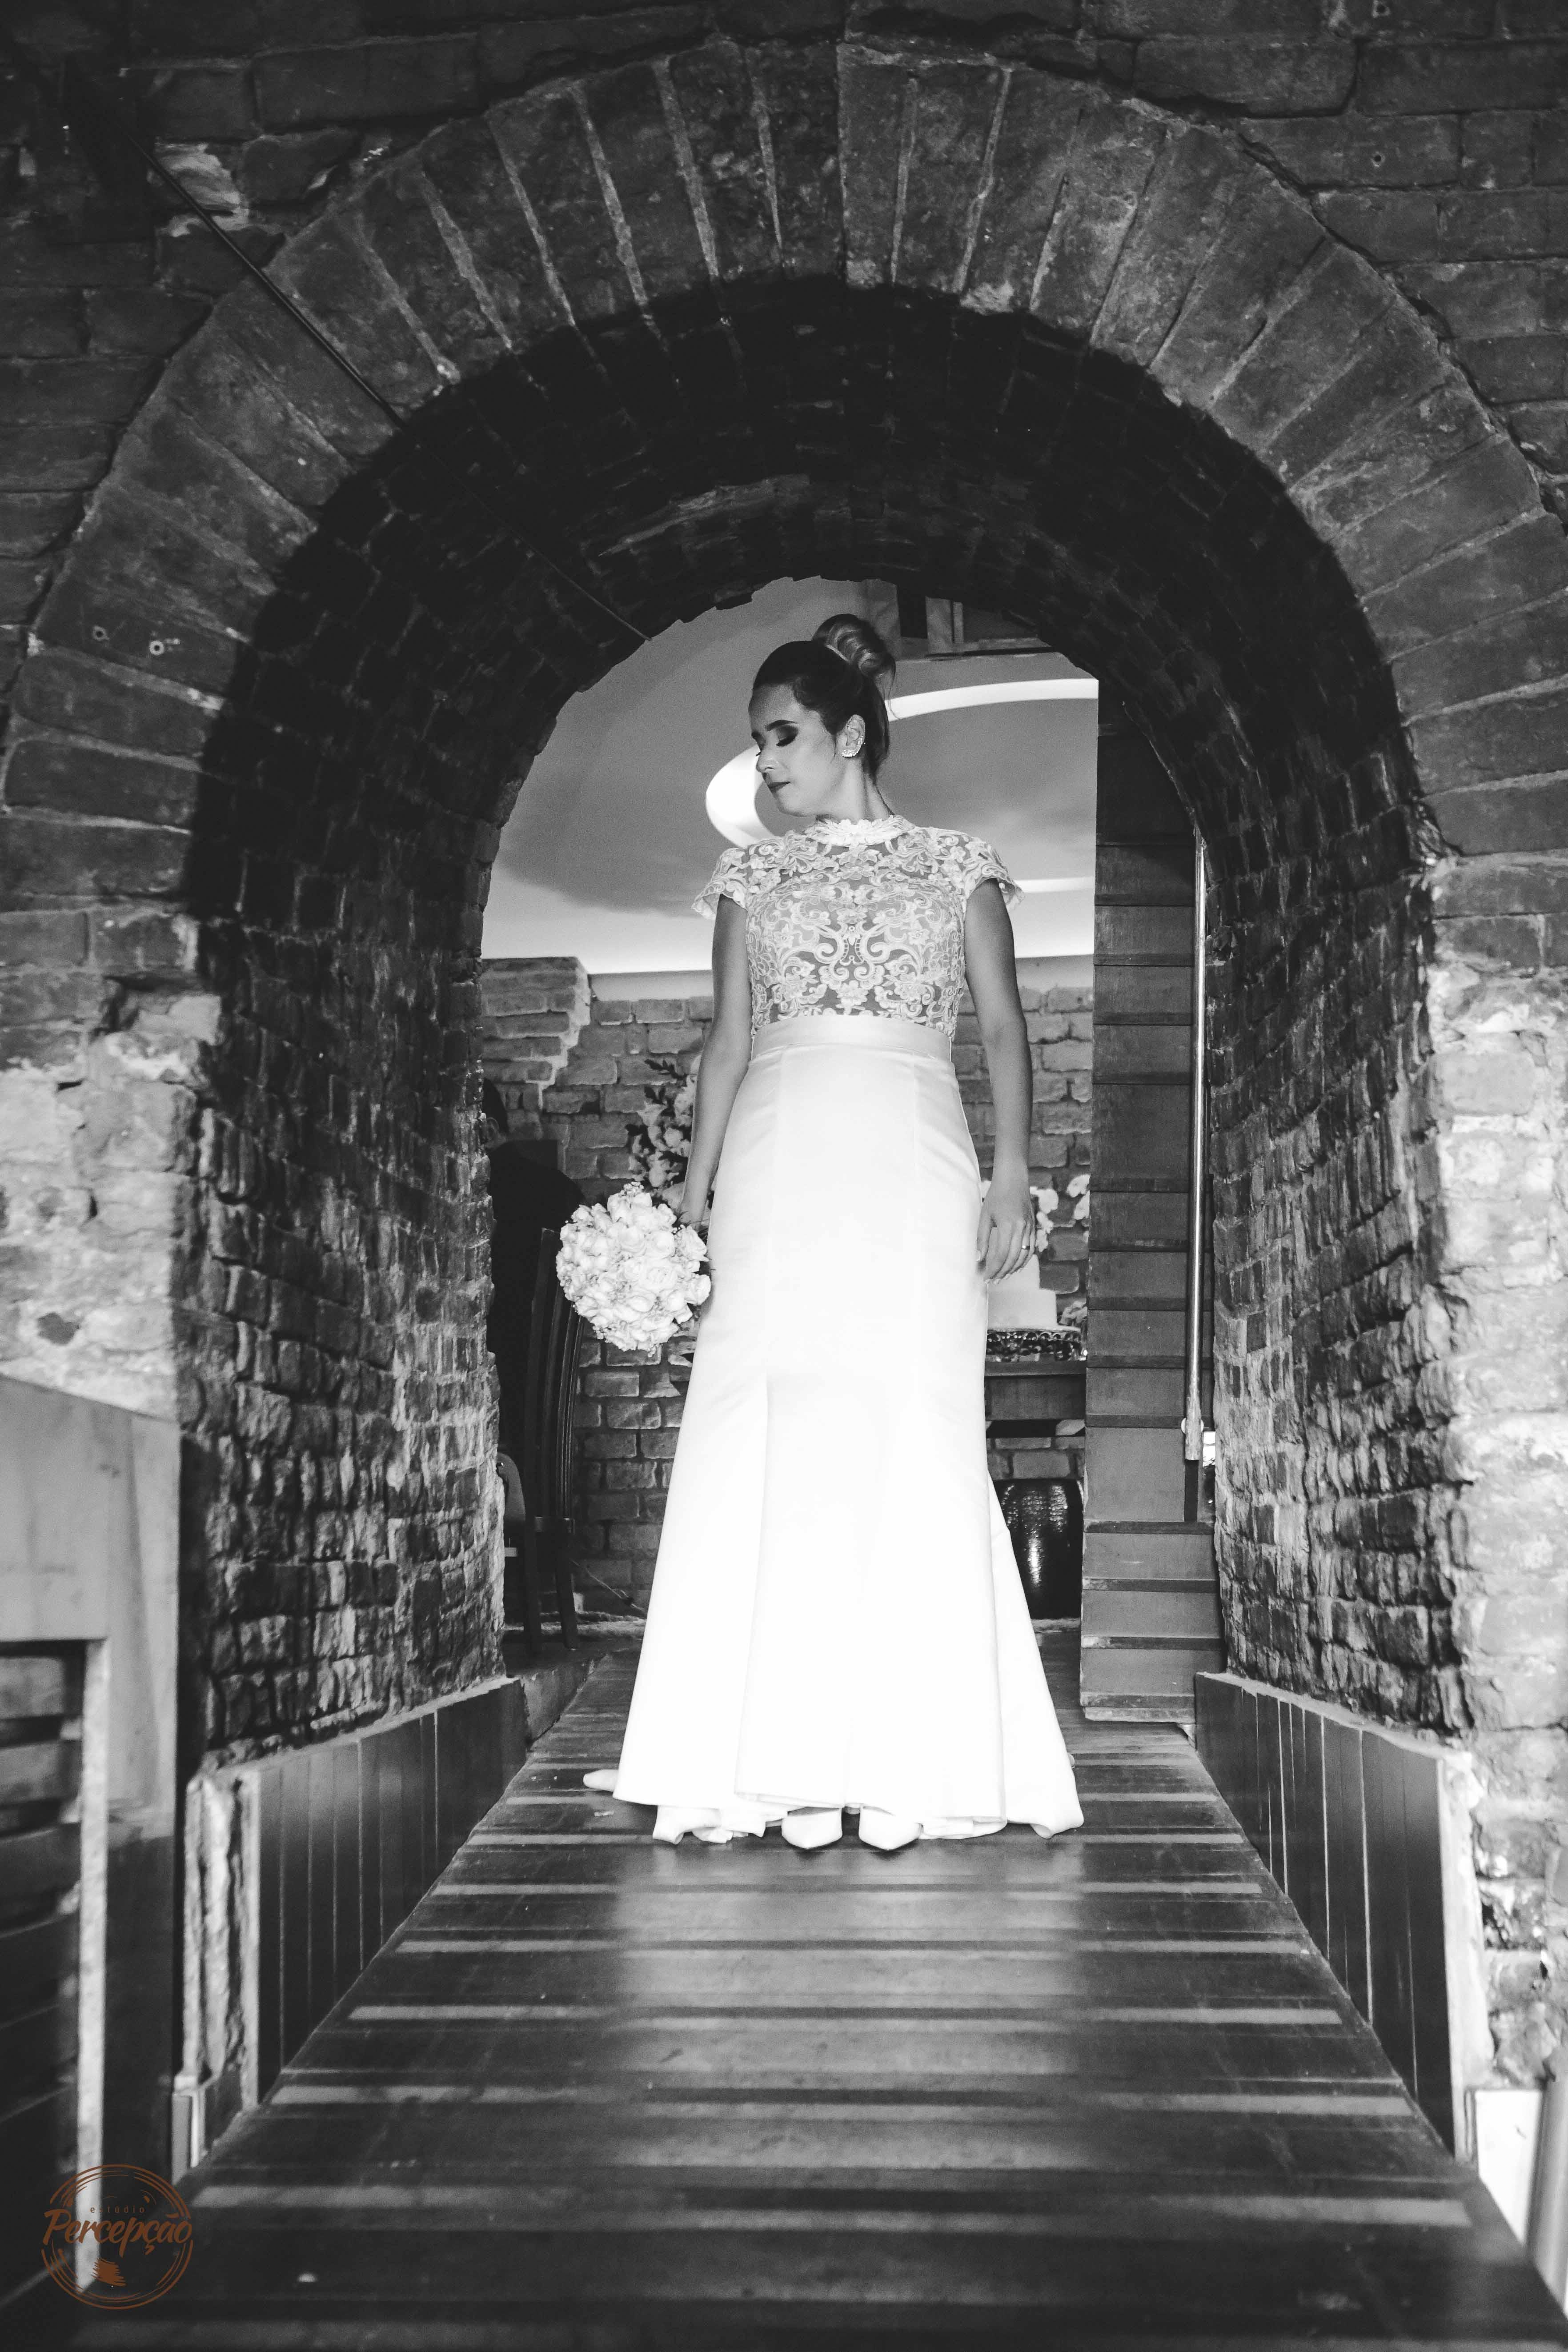 Casamento_de_Thiago_e_Lívia_internet-431